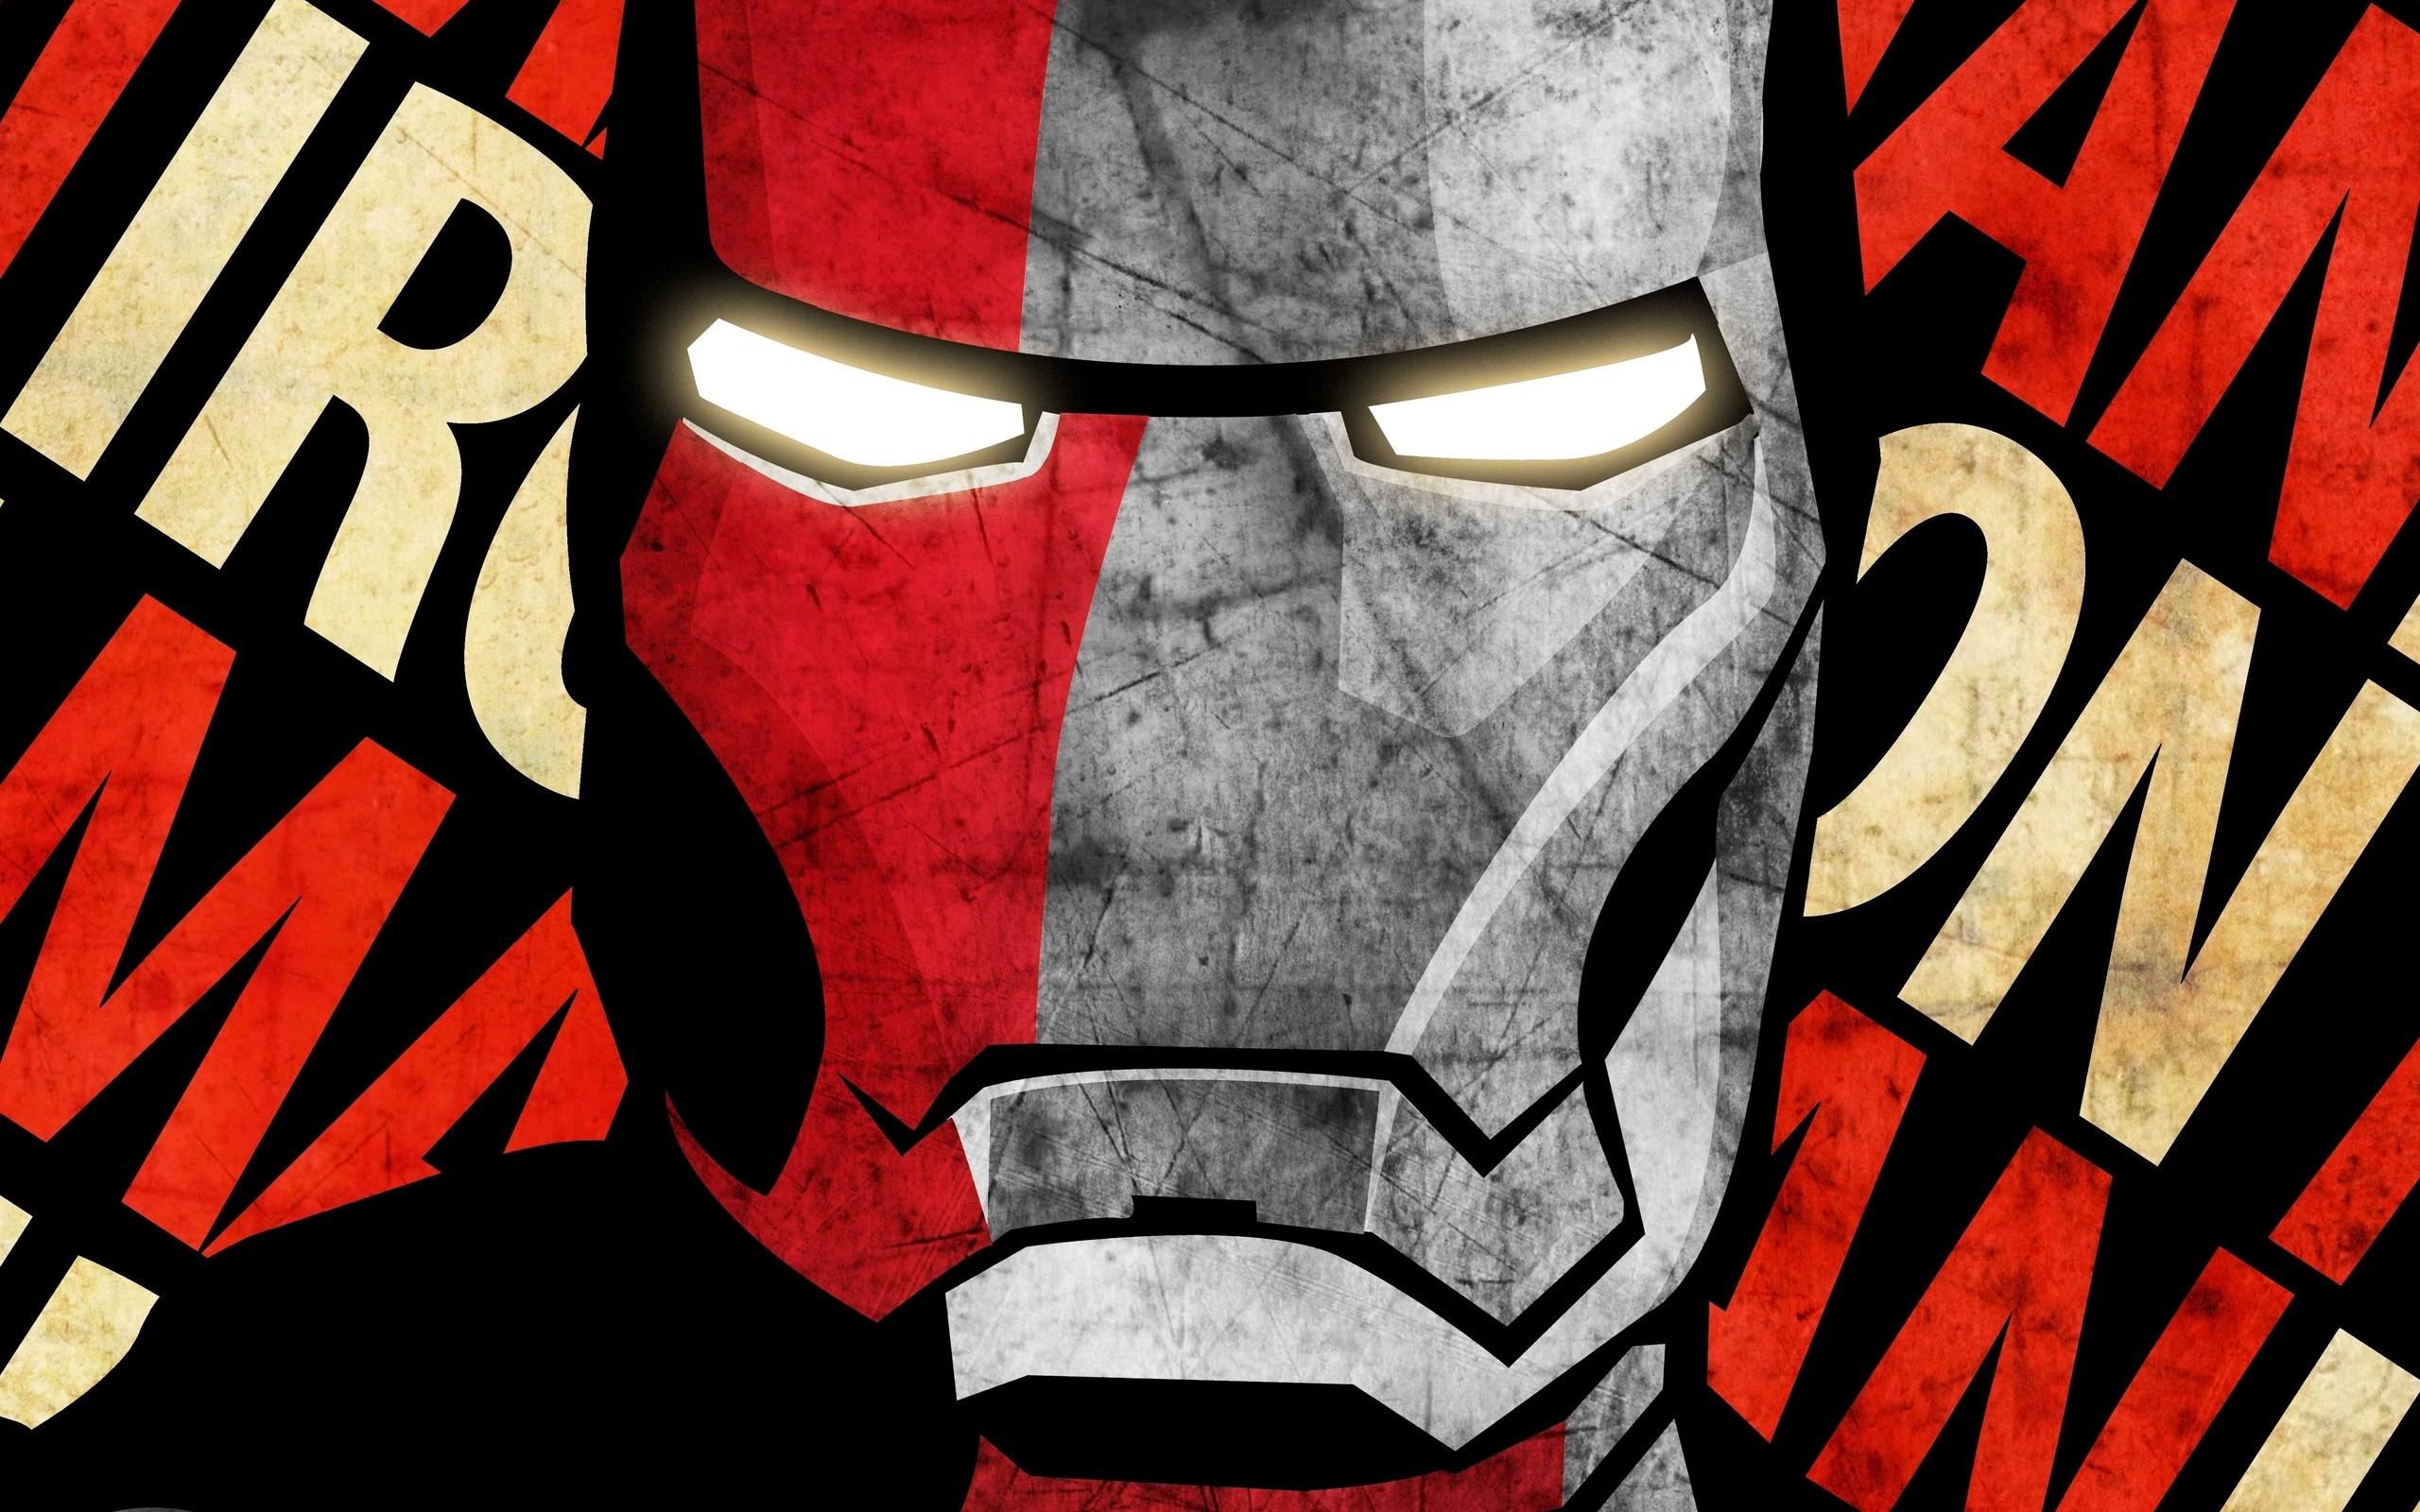 Iron Man Wallpaper 2560x1600 Iron Man Comics Superheroes Marvel 2560x1600